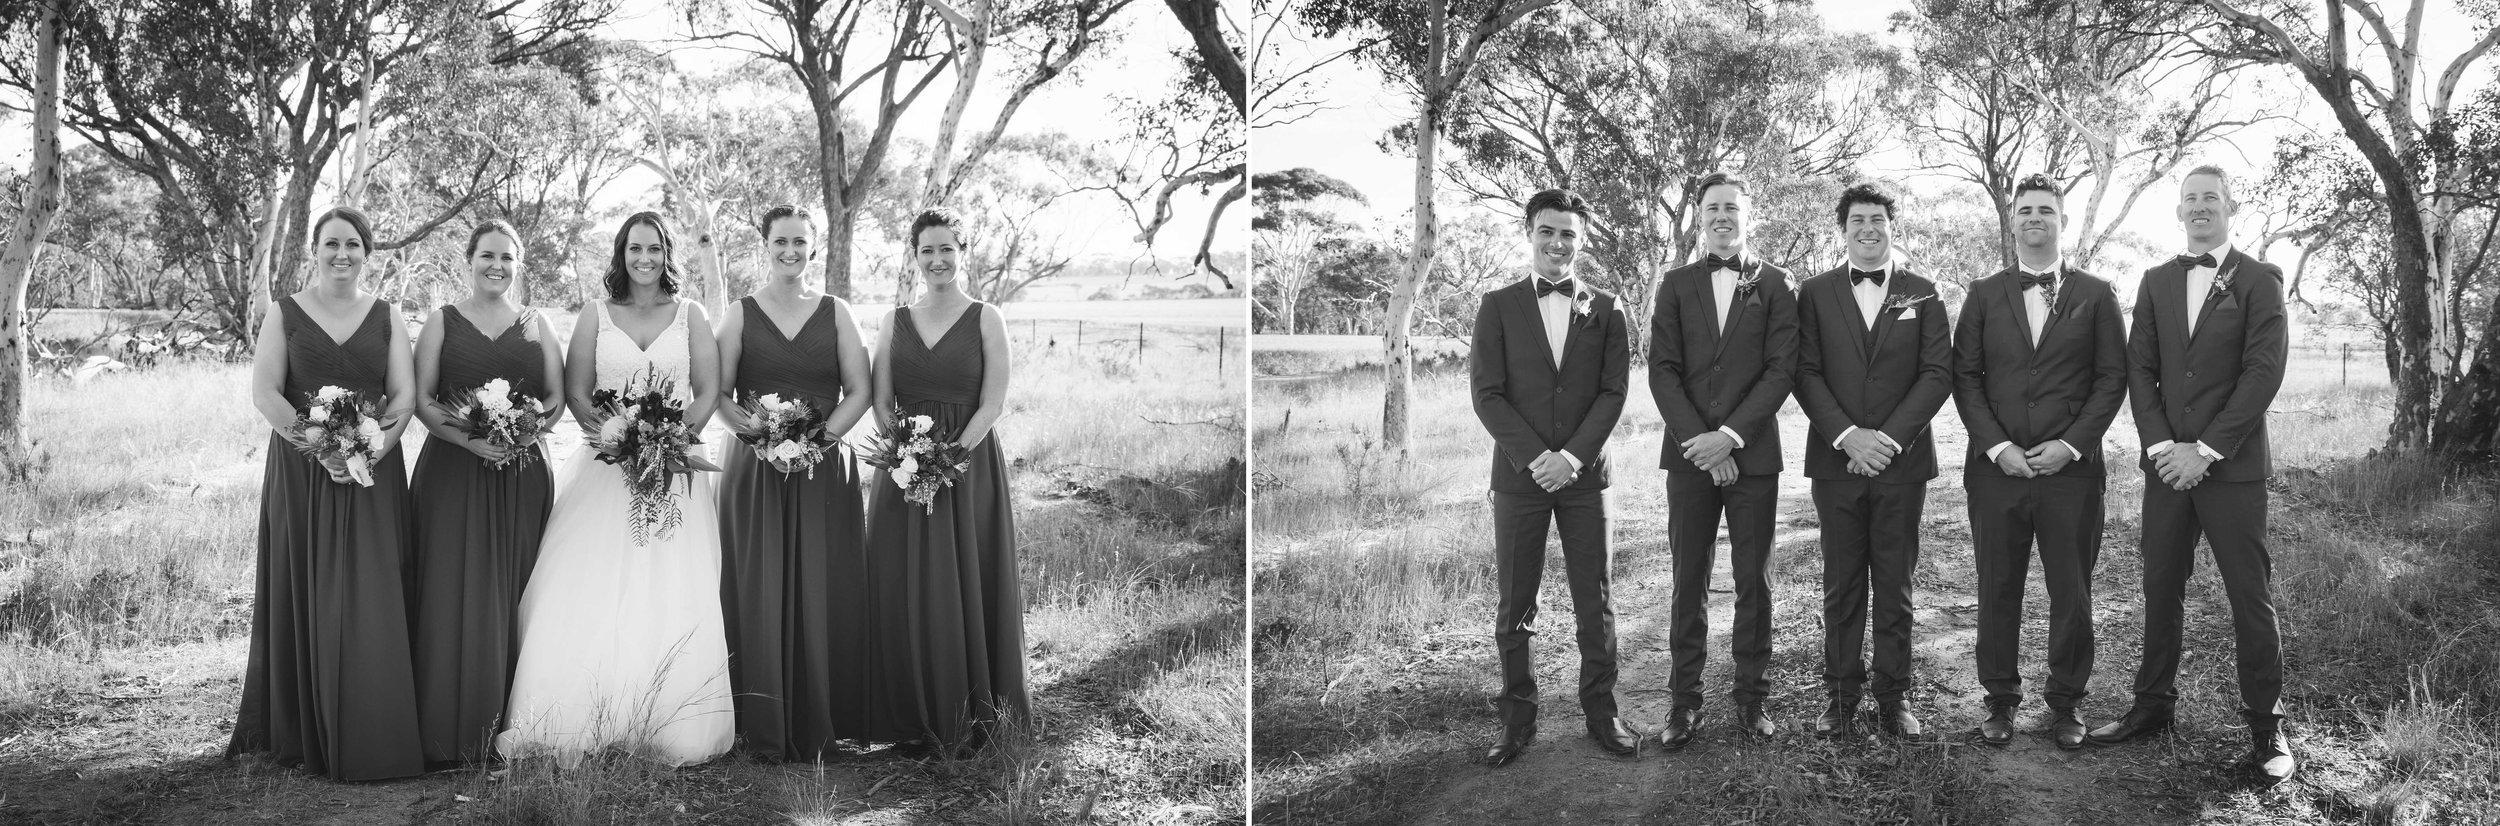 Angie Roe Photography Wheatbelt Avon Valley Farm Wedding (33and34).jpg